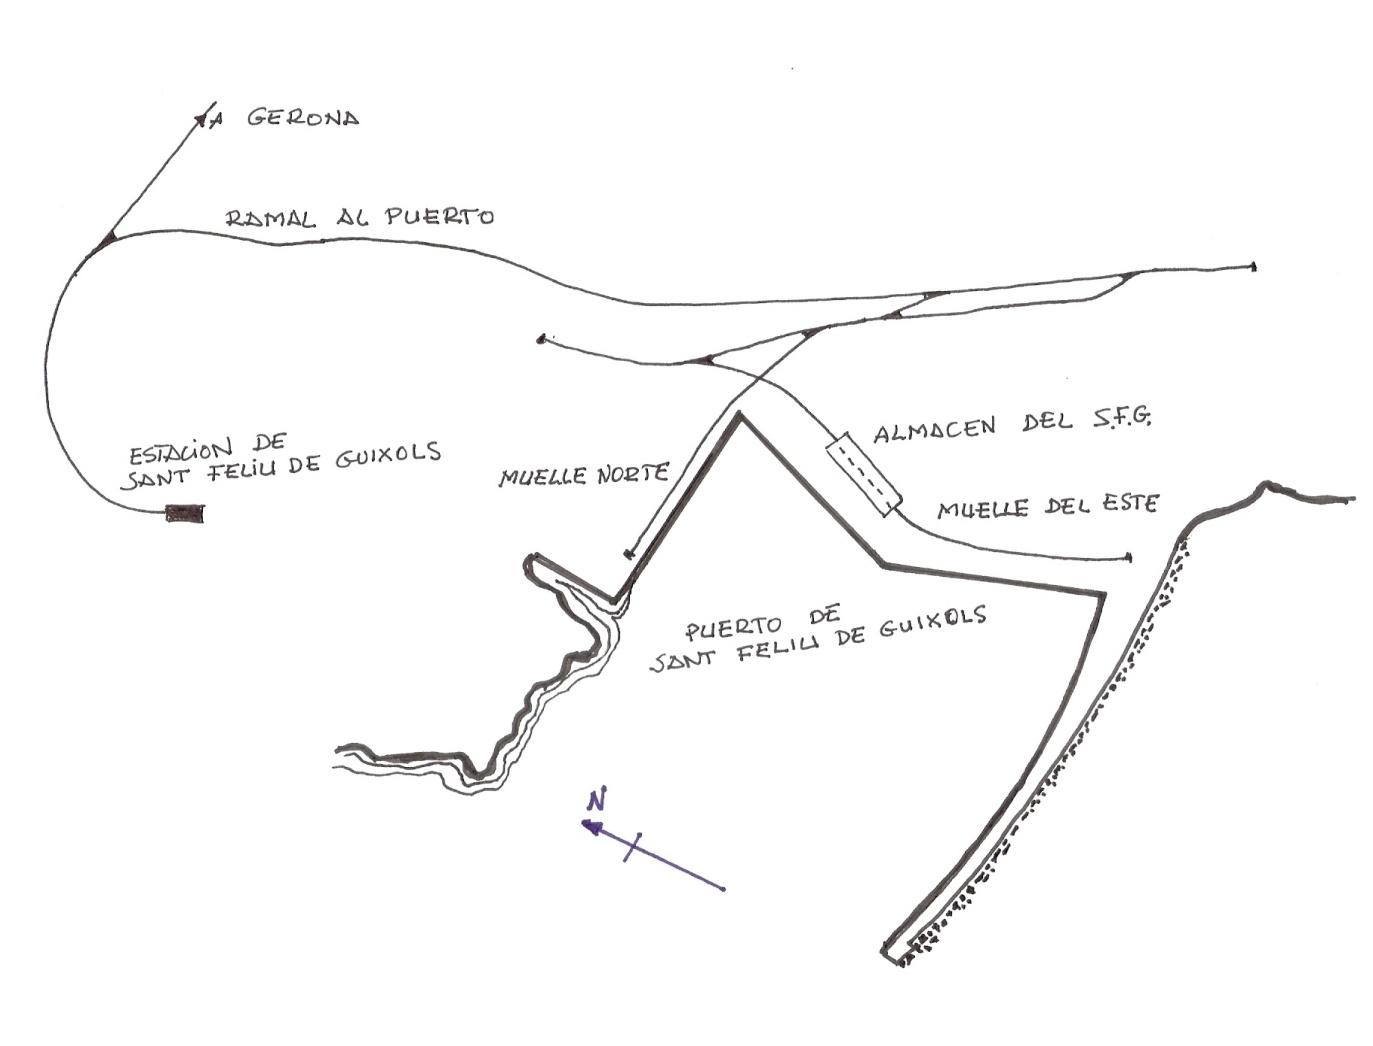 Ramal ferroviario al puerto de Sant Feñliu de Guixols, dibujo: Juan Peris Torner